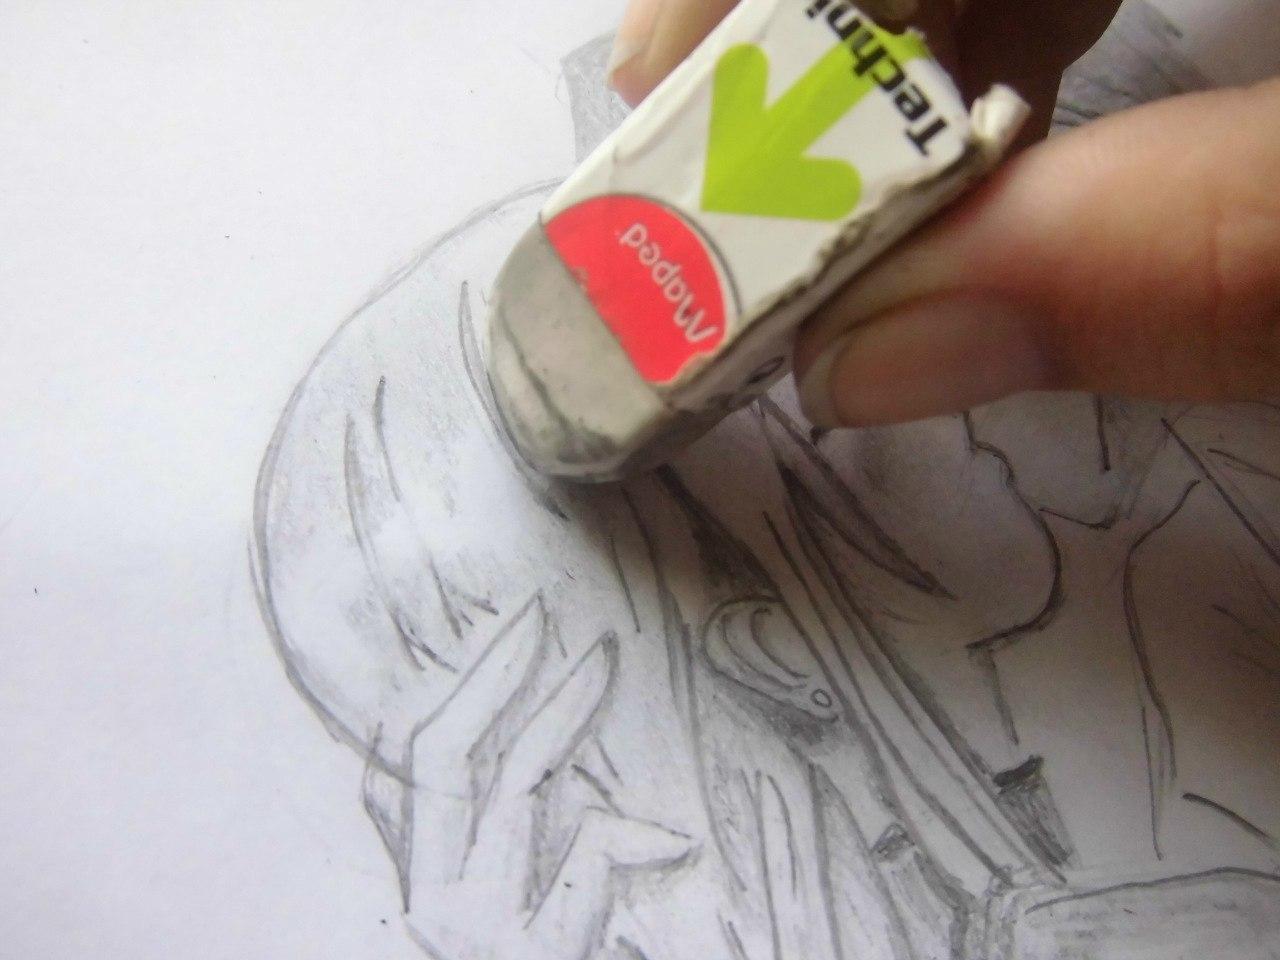 urok_risovanie_karandashom_celuyushhiesya_anime_pary-step-5 Как нарисовать пару из Вокалоидов карандашом поэтапно